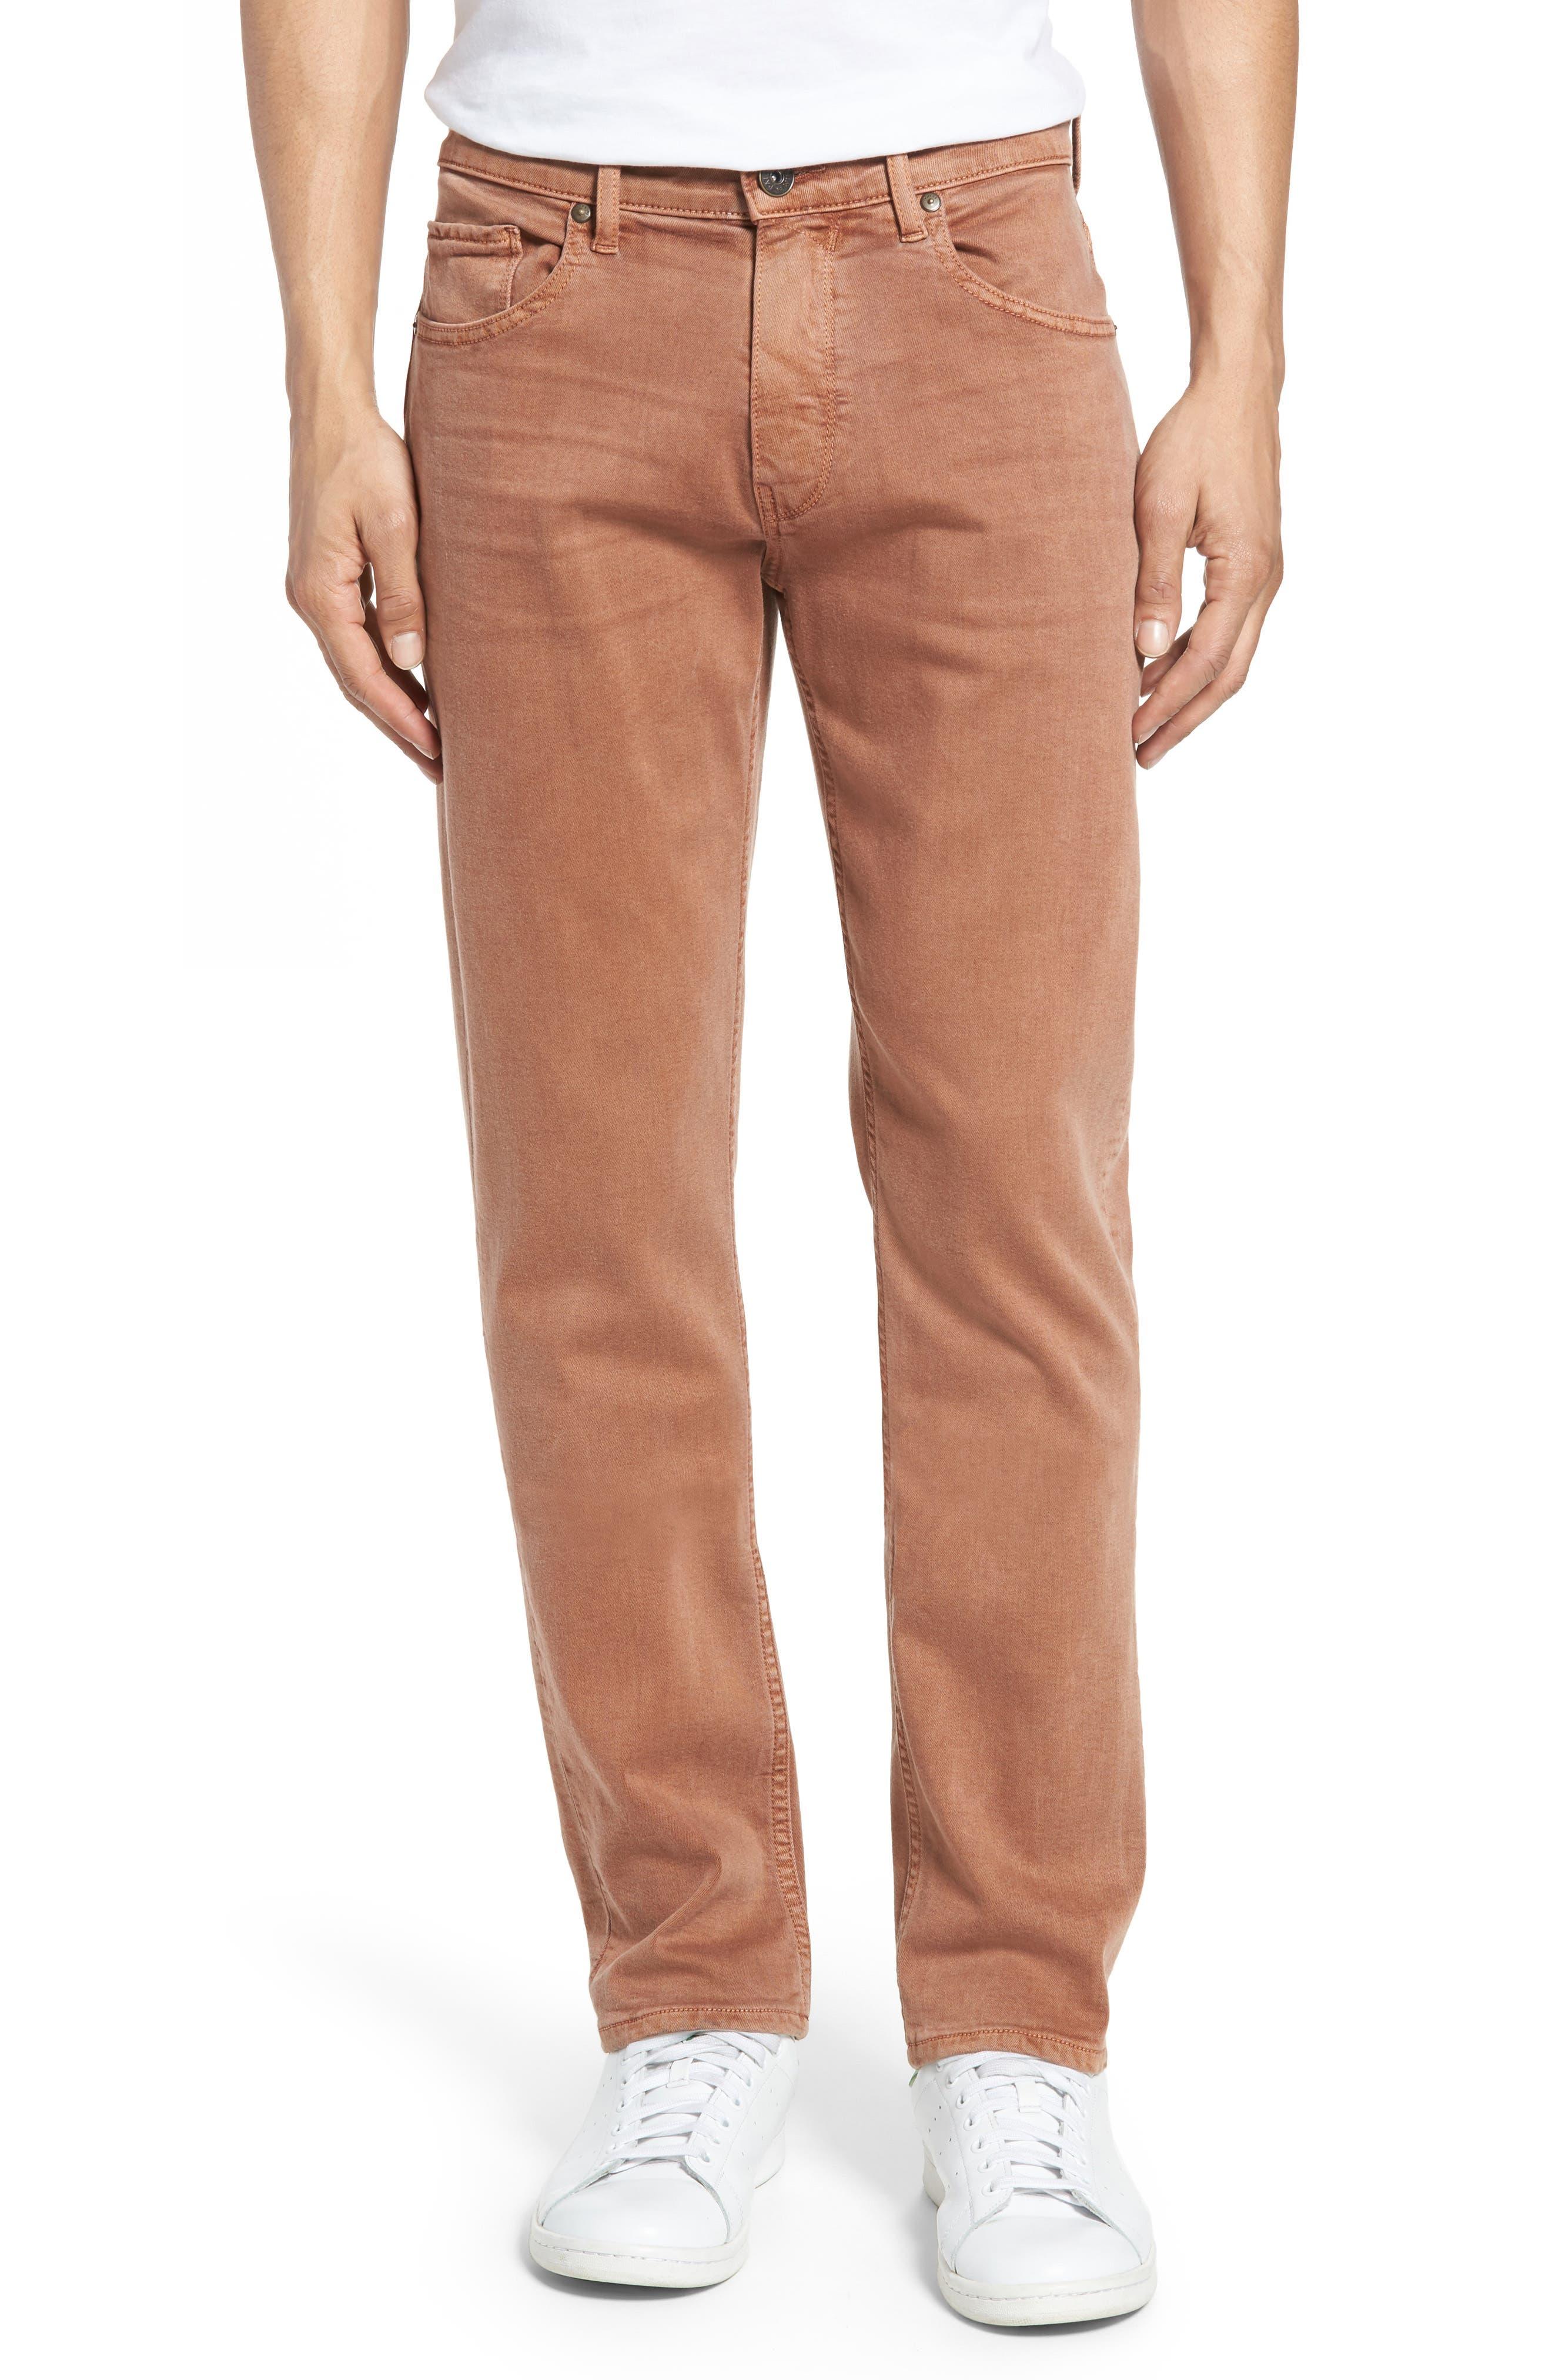 Main Image - PAIGE Transcend - Federal Slim Straight Leg Jeans (Vintage Bronzed)